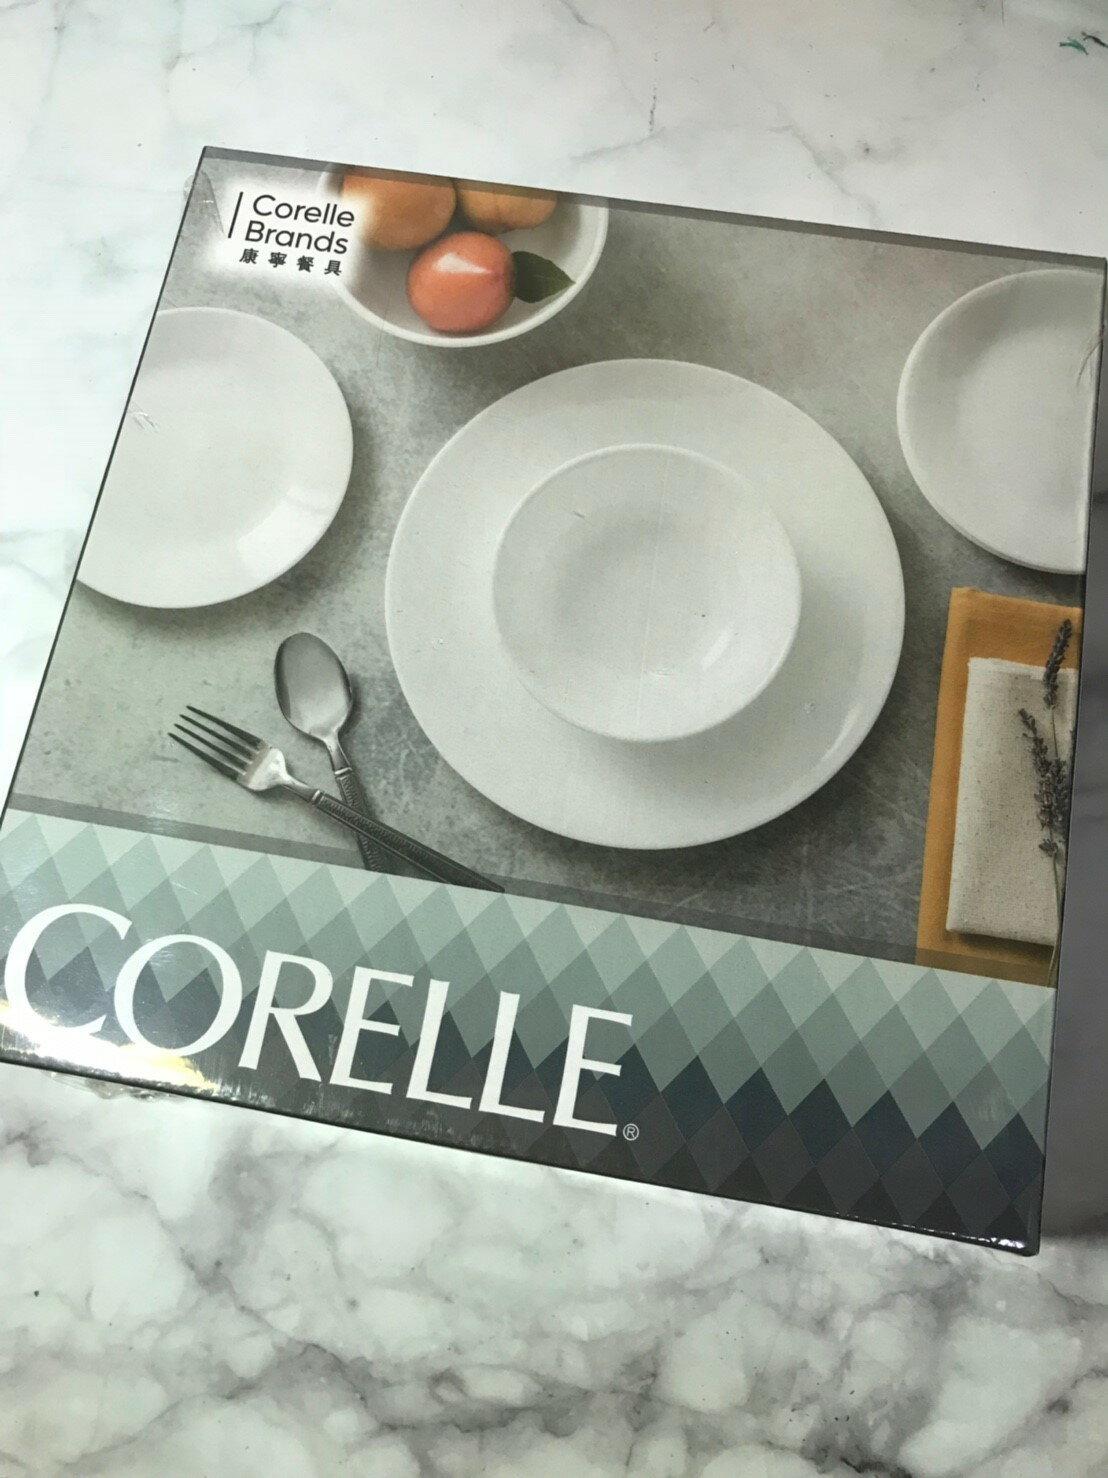 【CORELLE 康寧】純白2件式餐盤組(6吋深盤+8吋深盤)【淨妍美肌】